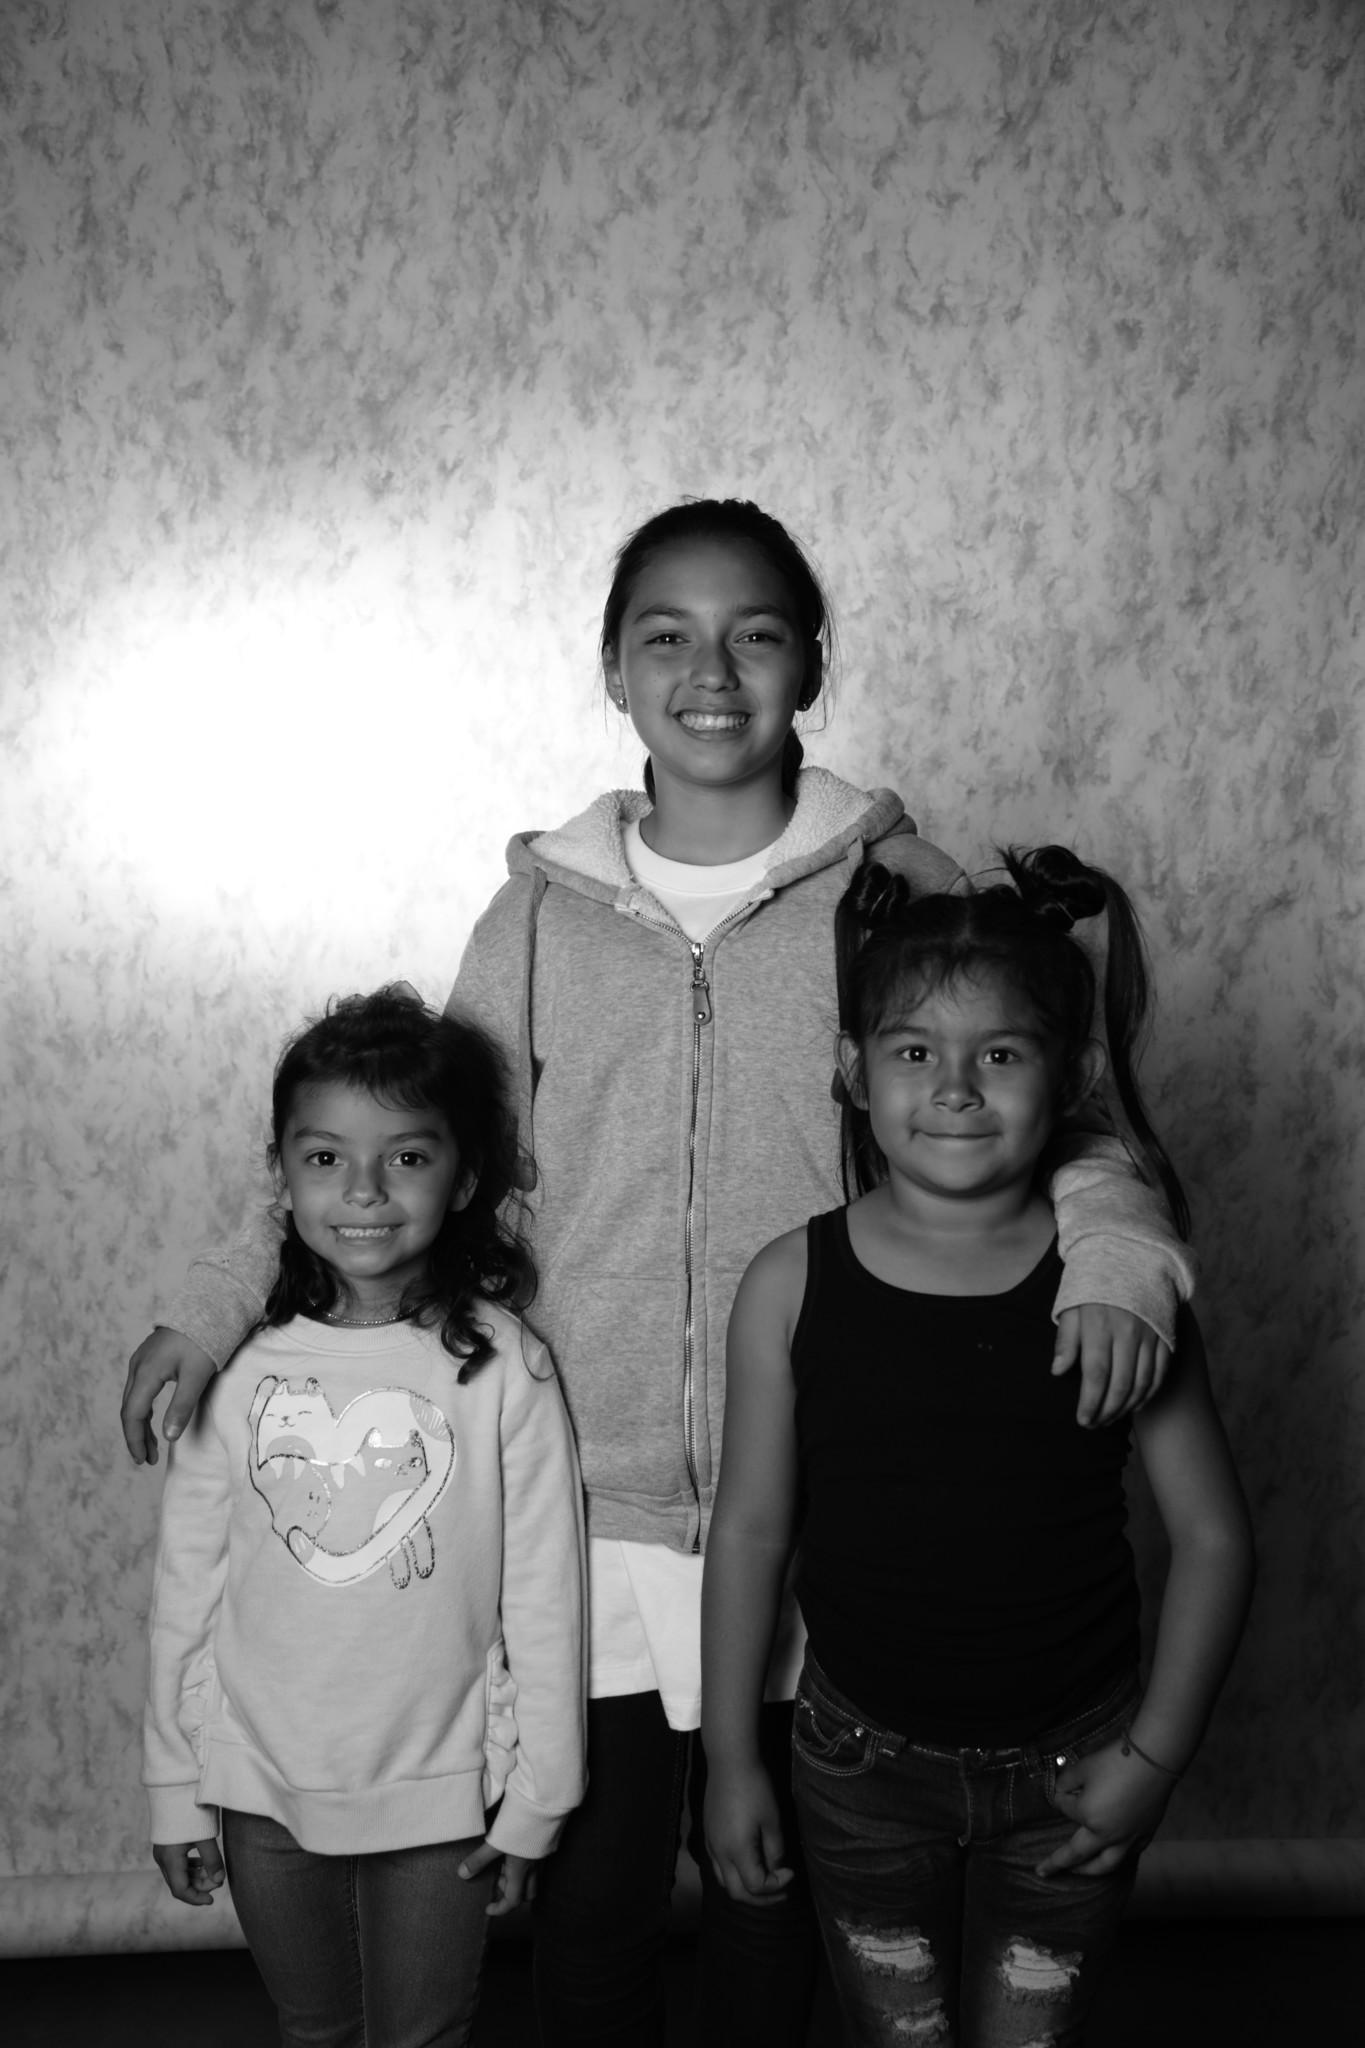 Allisson Maldonado, center, with Hayley Maldonado, left, and Grecia Flores, right.